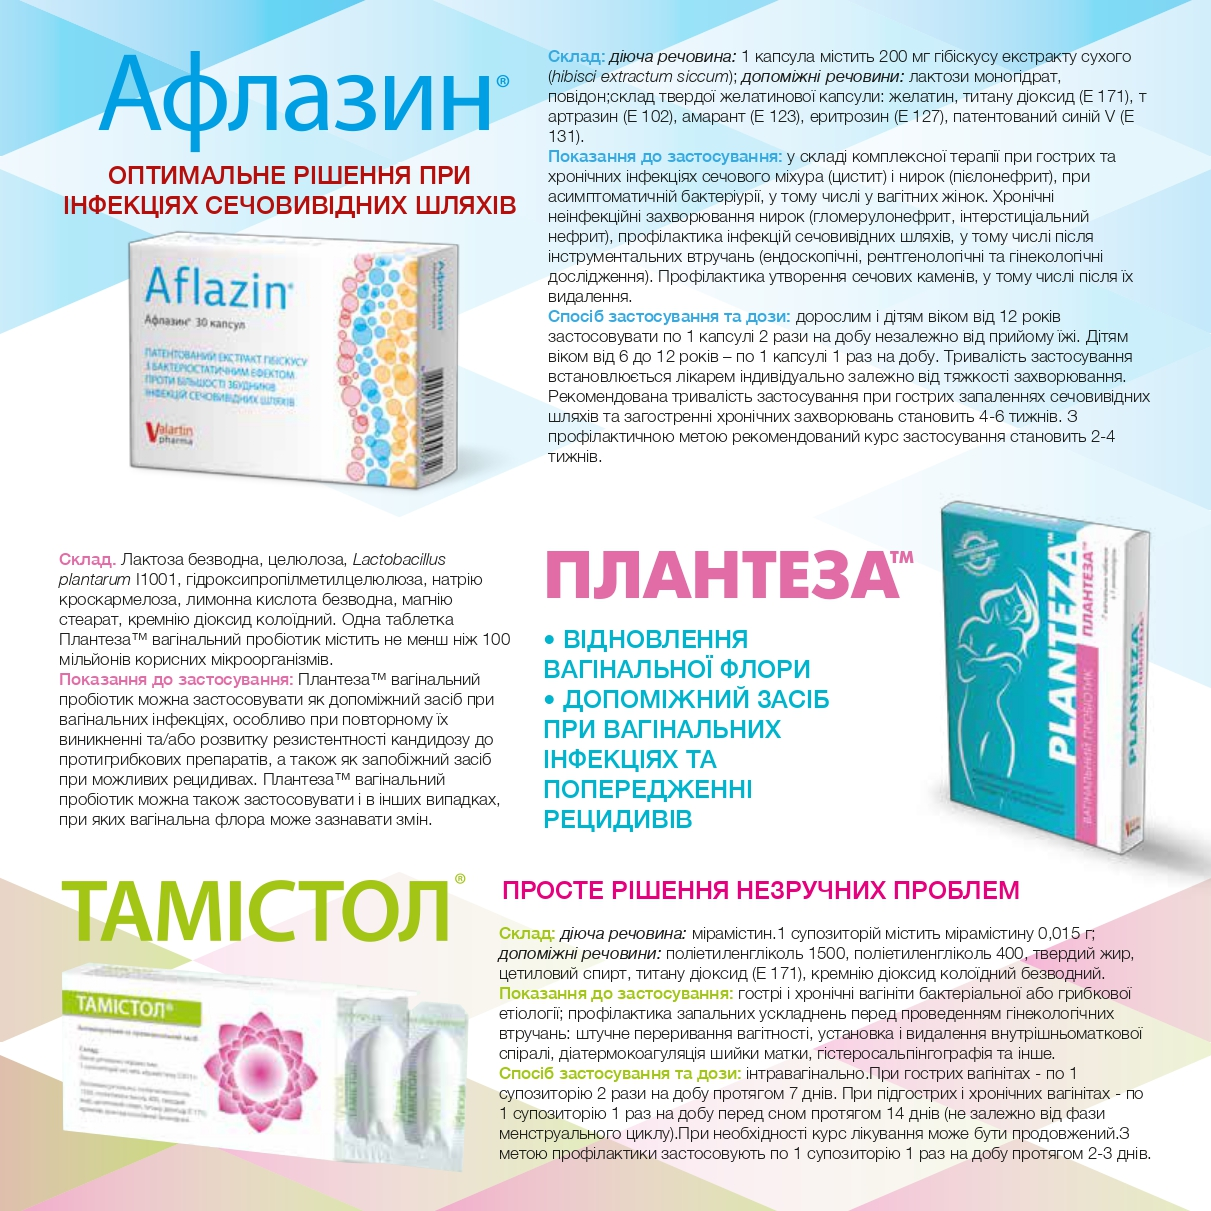 общии_ буклет205x205 2019_page-0005